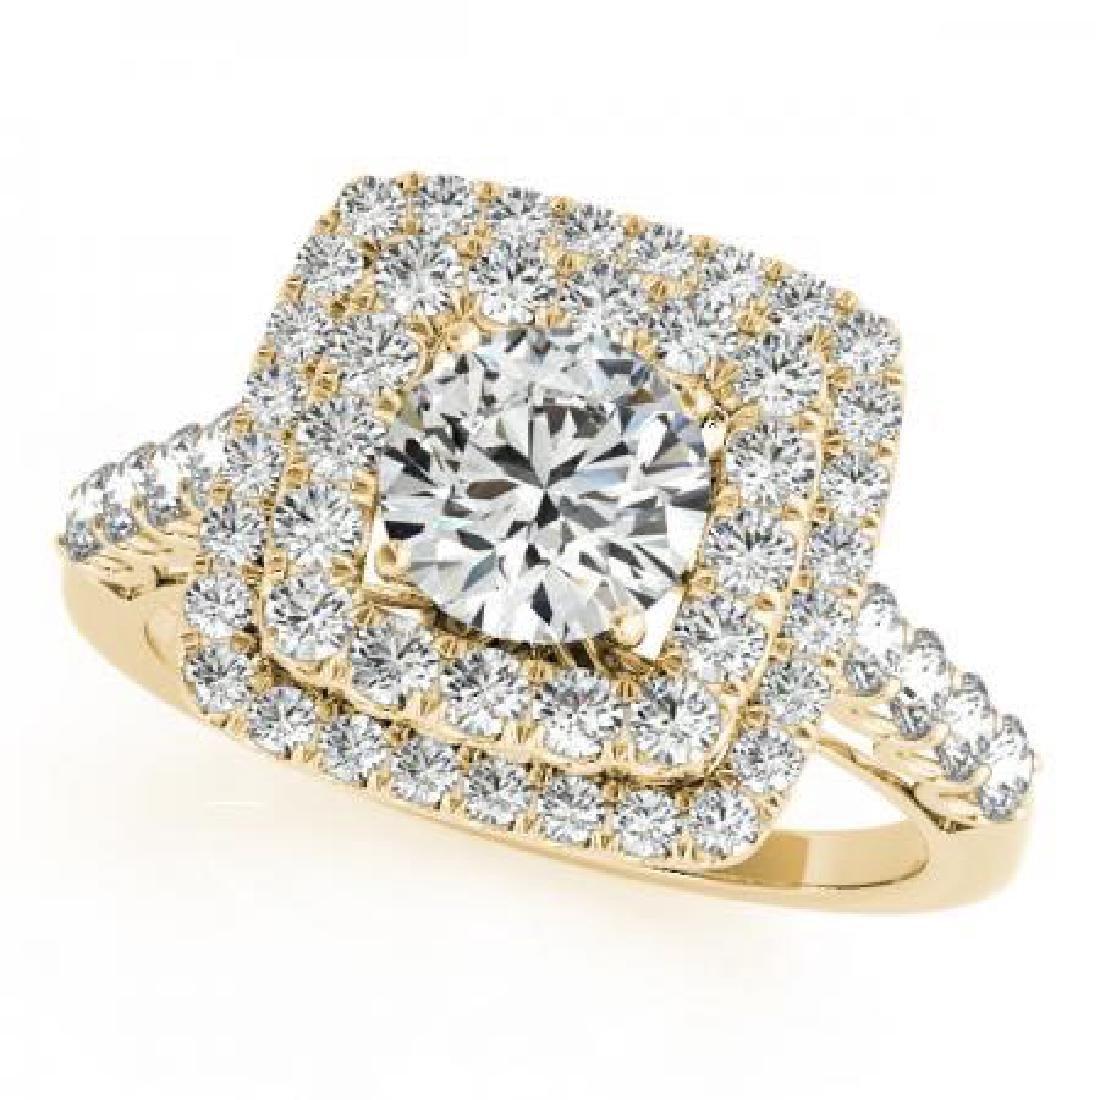 CERTIFIED 18K YELLOW GOLD 2.14 CT G-H/VS-SI1 DIAMOND HA